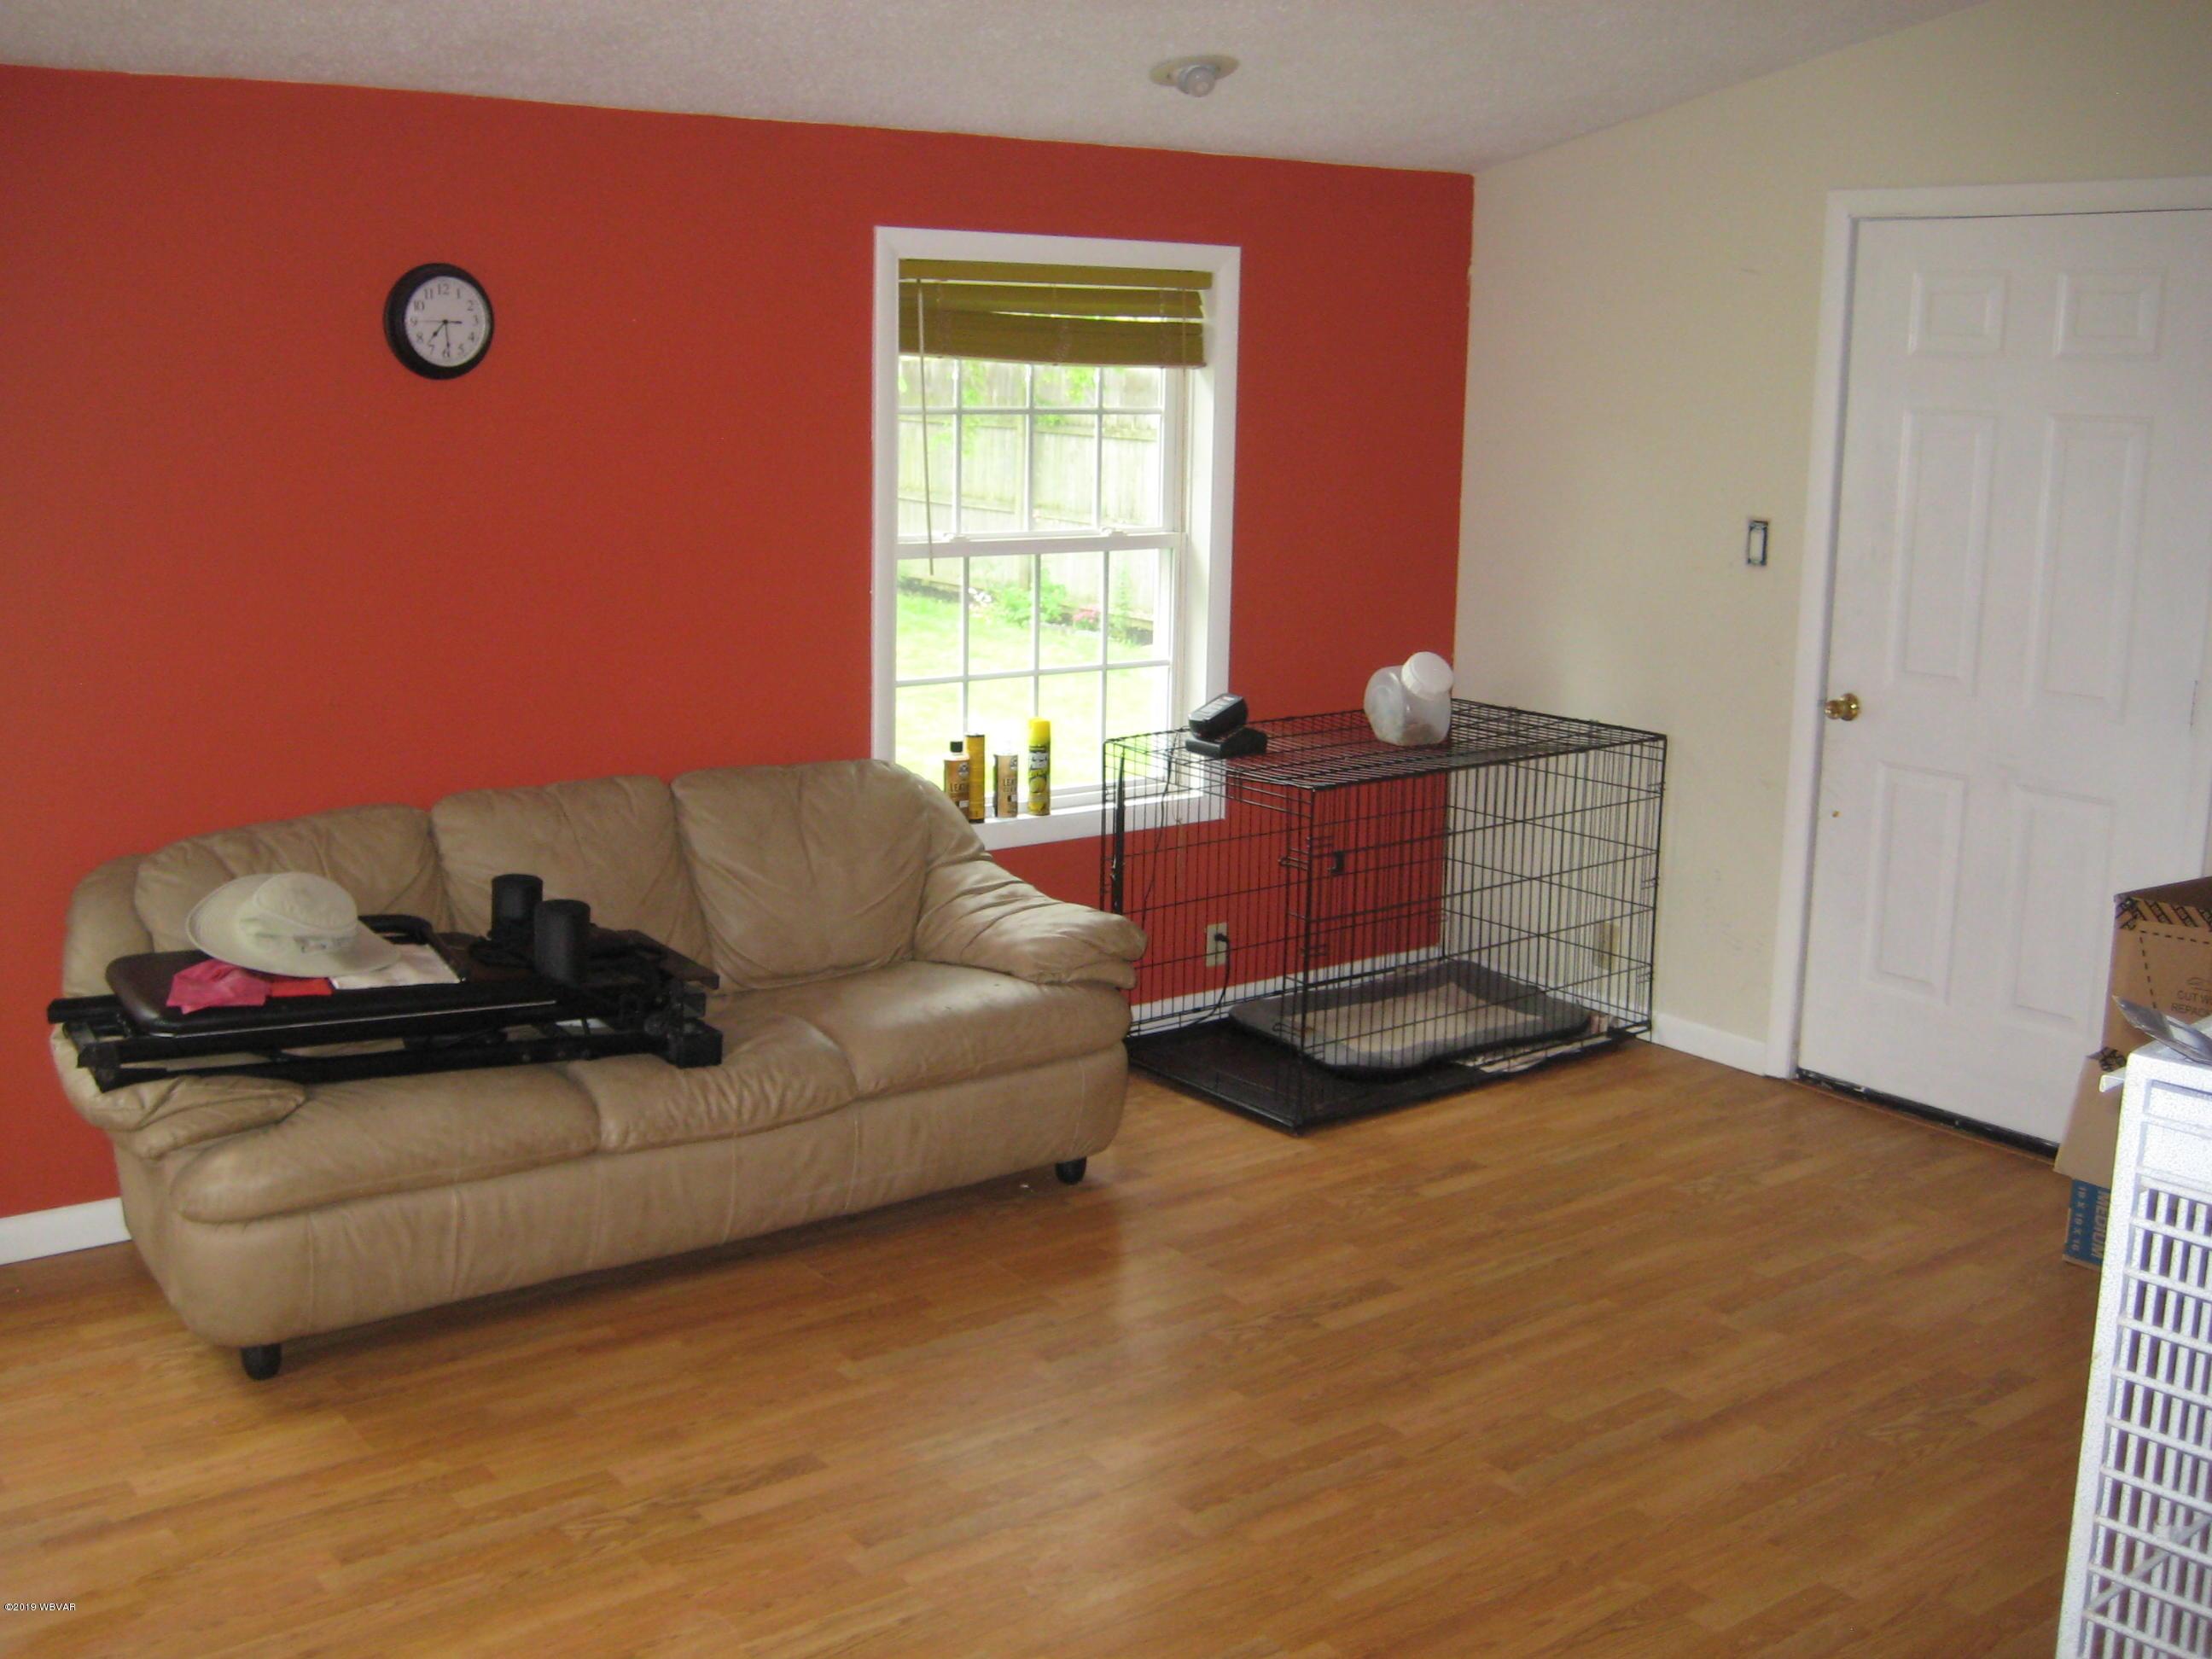 340 TINSMAN AVENUE,Williamsport,PA 17701,3 Bedrooms Bedrooms,1.5 BathroomsBathrooms,Residential,TINSMAN,WB-87630